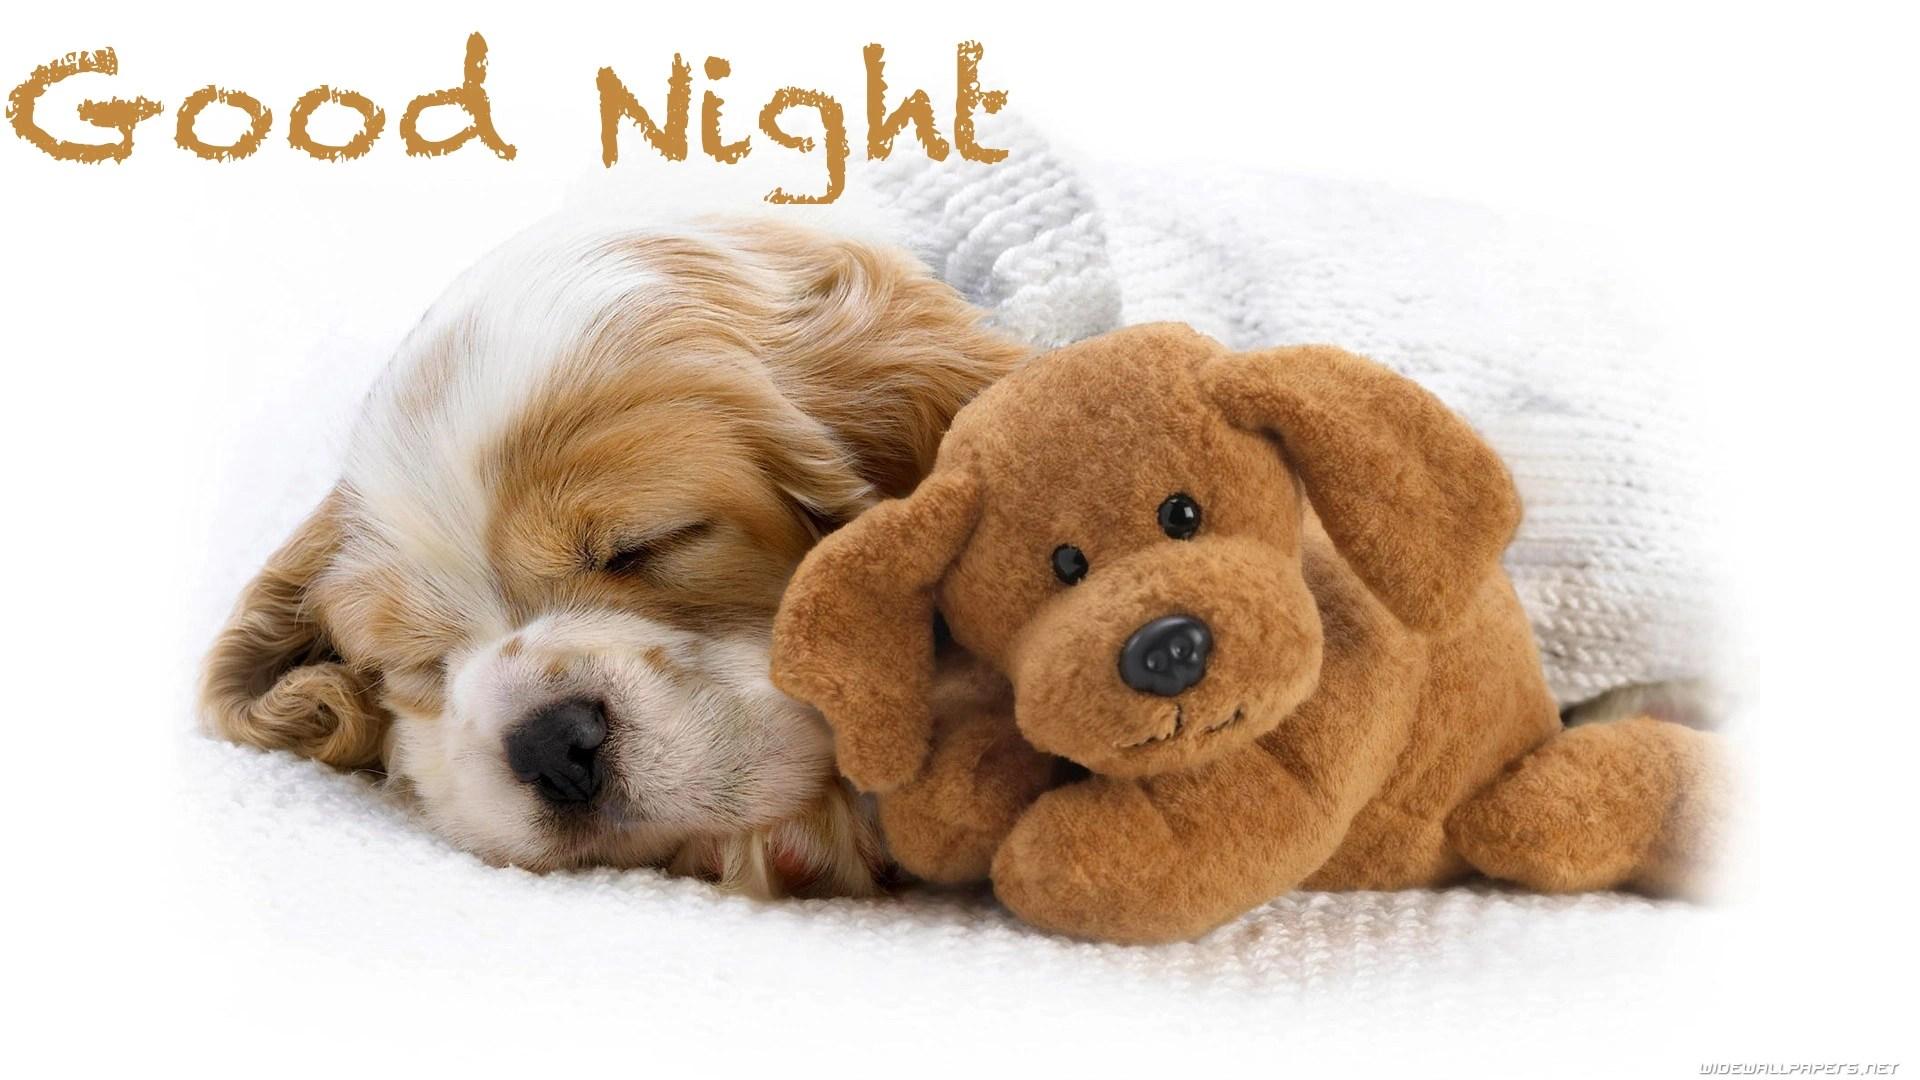 Good night dog image